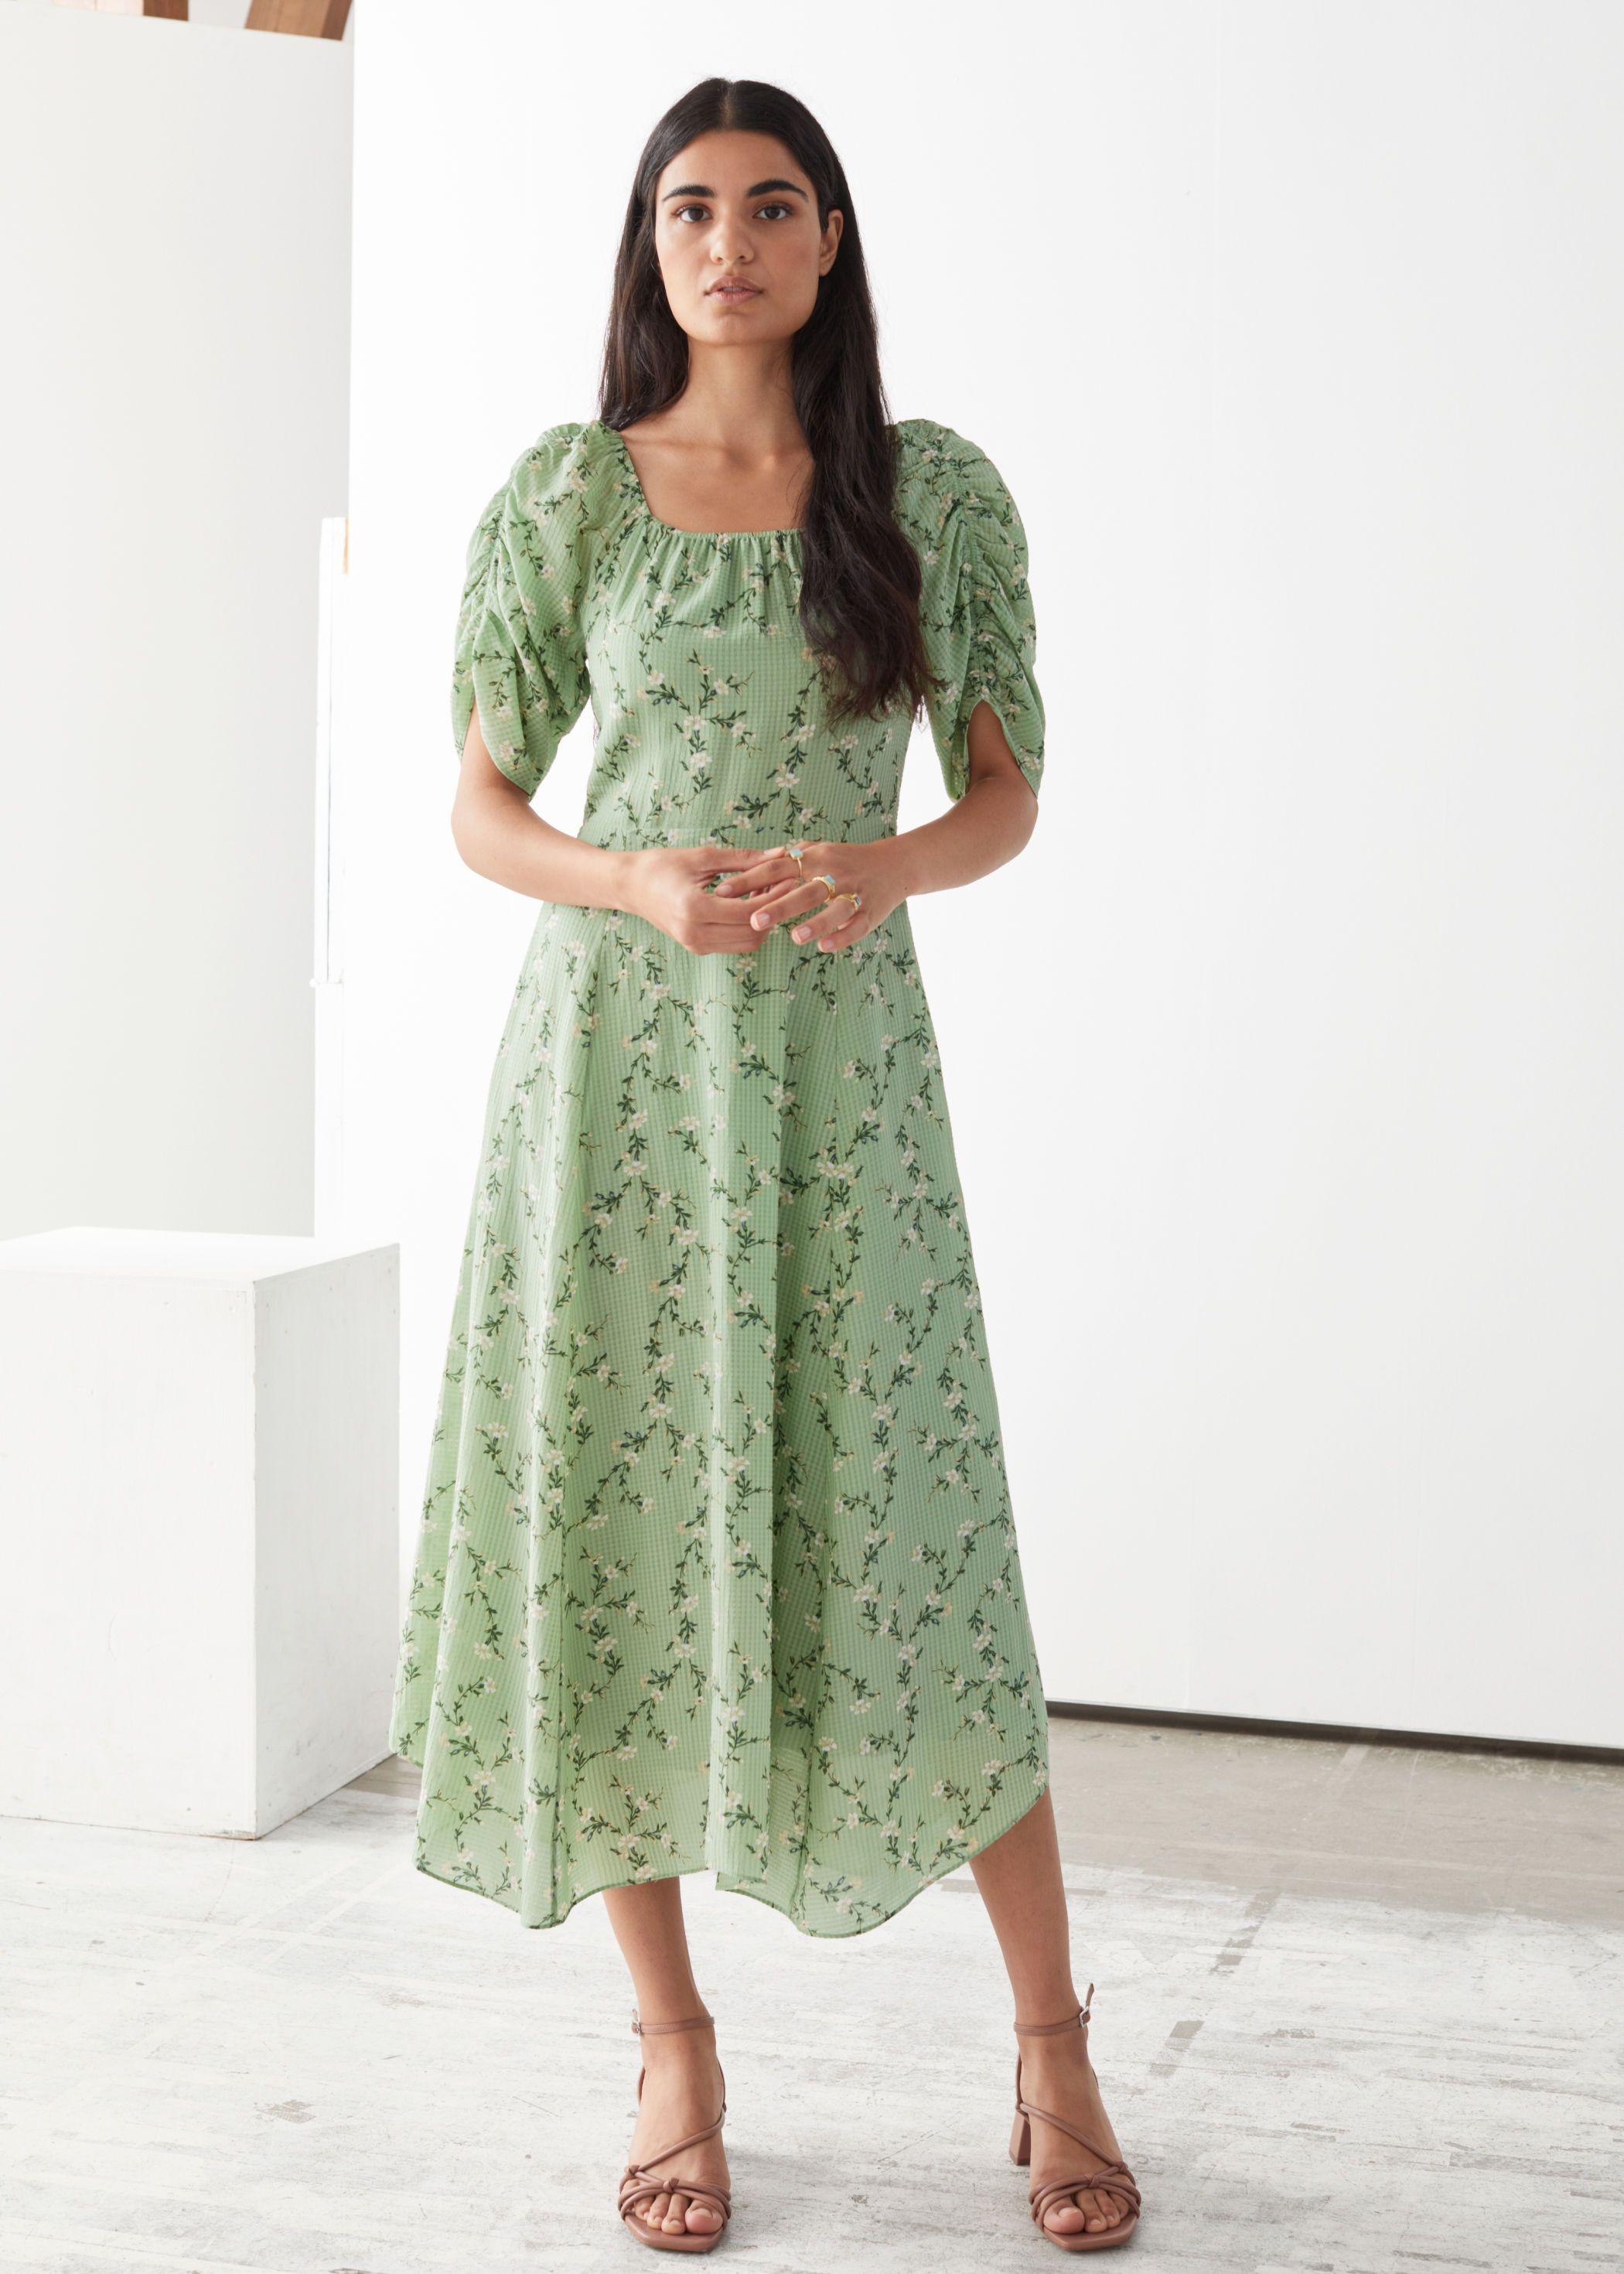 Rouched Sleeve Midi Dress Midi Dress With Sleeves Fashion Tops Blouse Midi Dress [ 2940 x 2100 Pixel ]